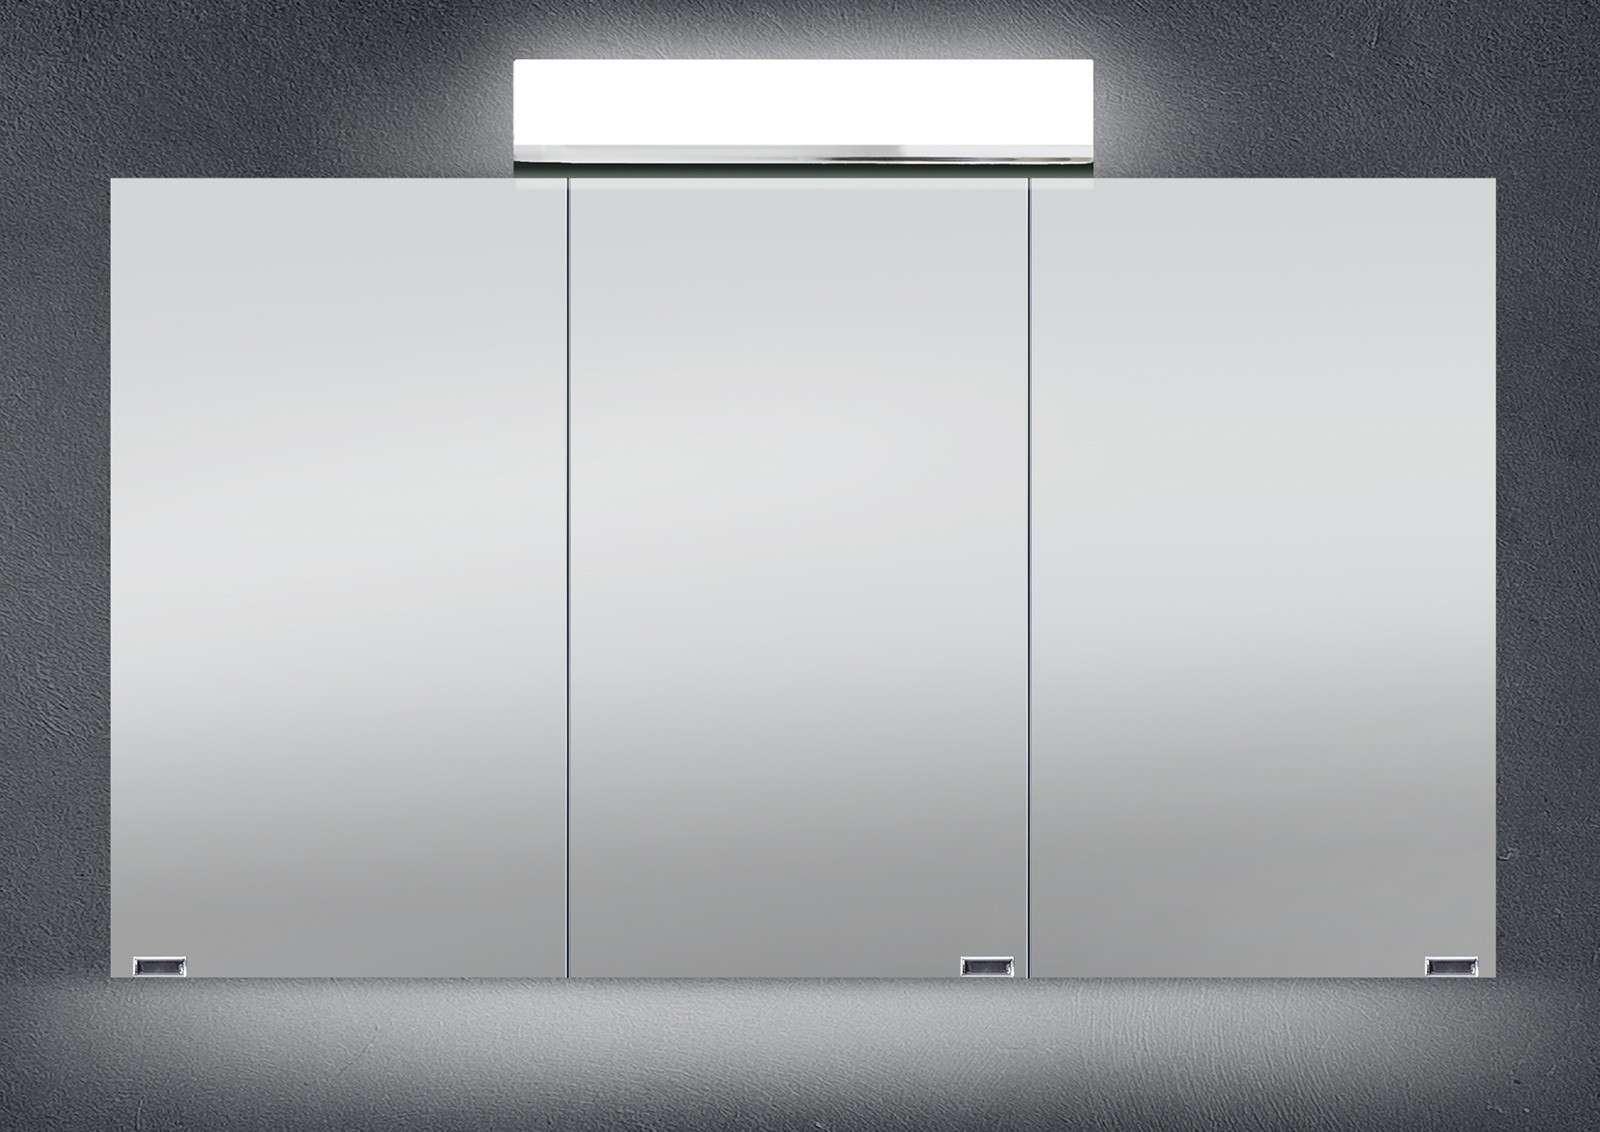 Badezimmer Spiegelschrank Beleuchtung IA87 – Hitoiro